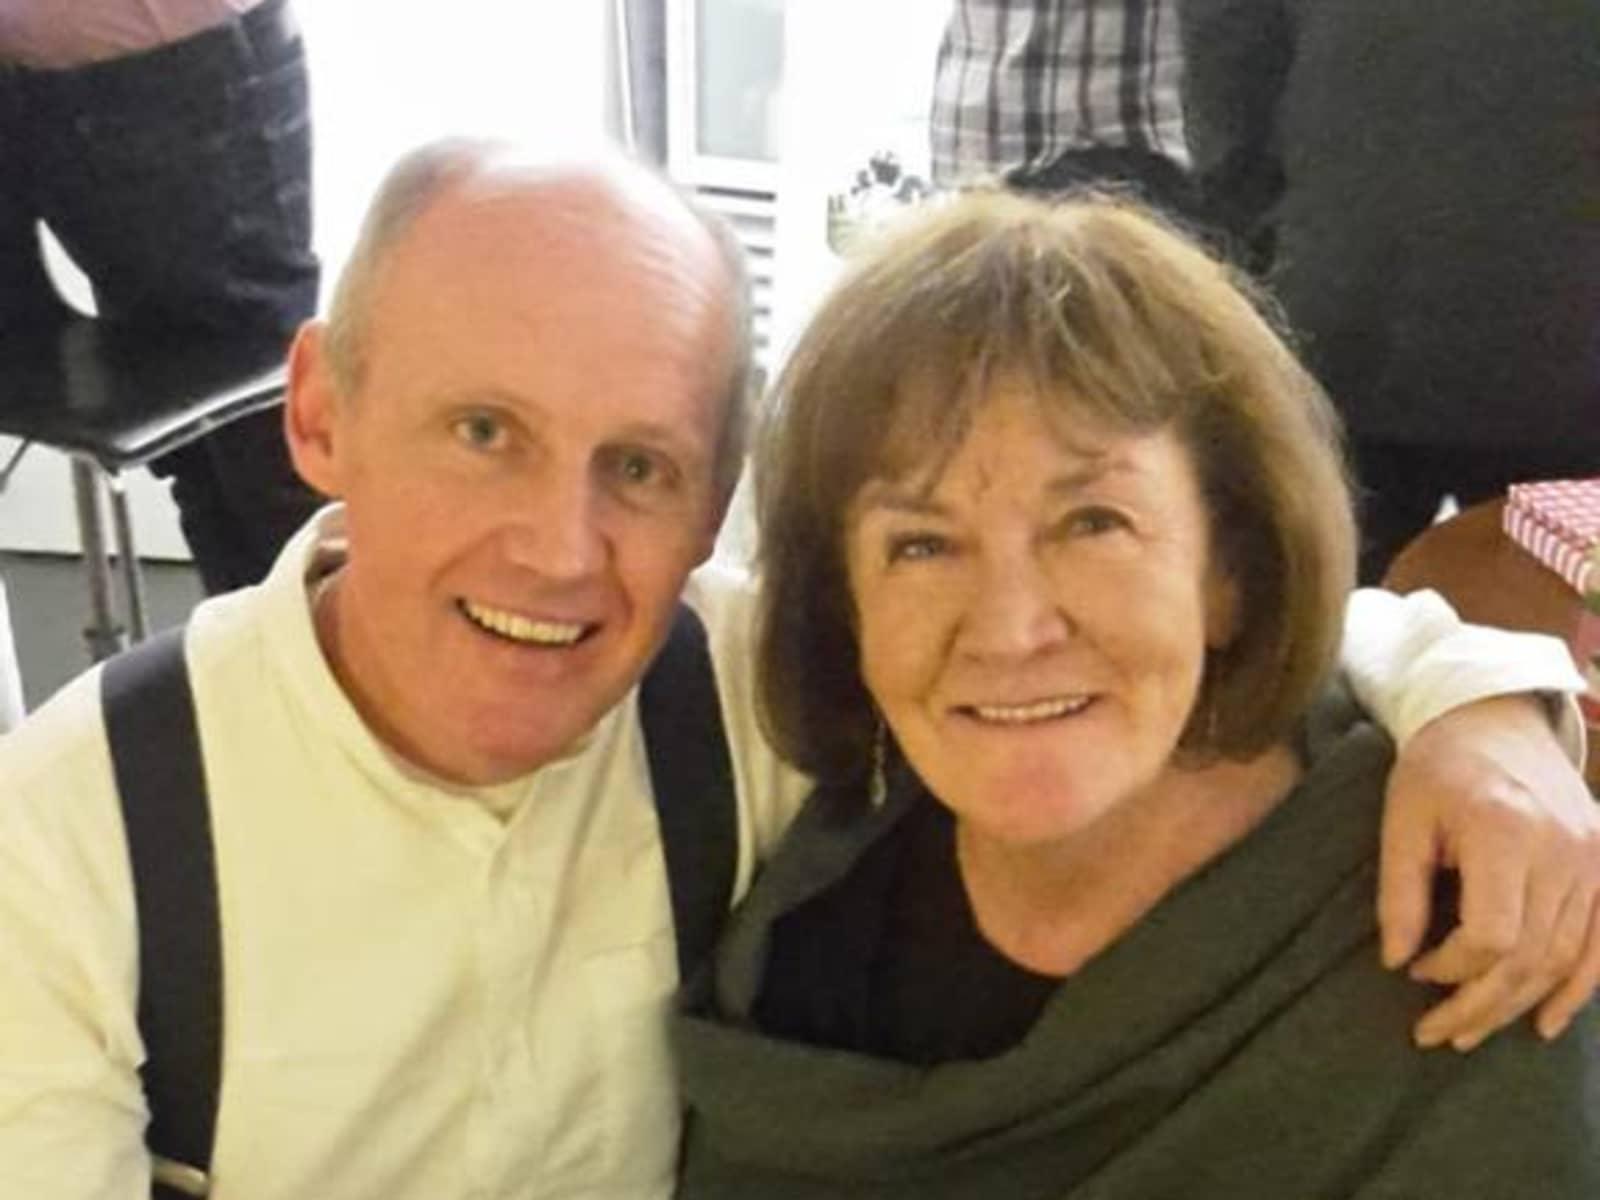 Helen from Monaghan, Ireland